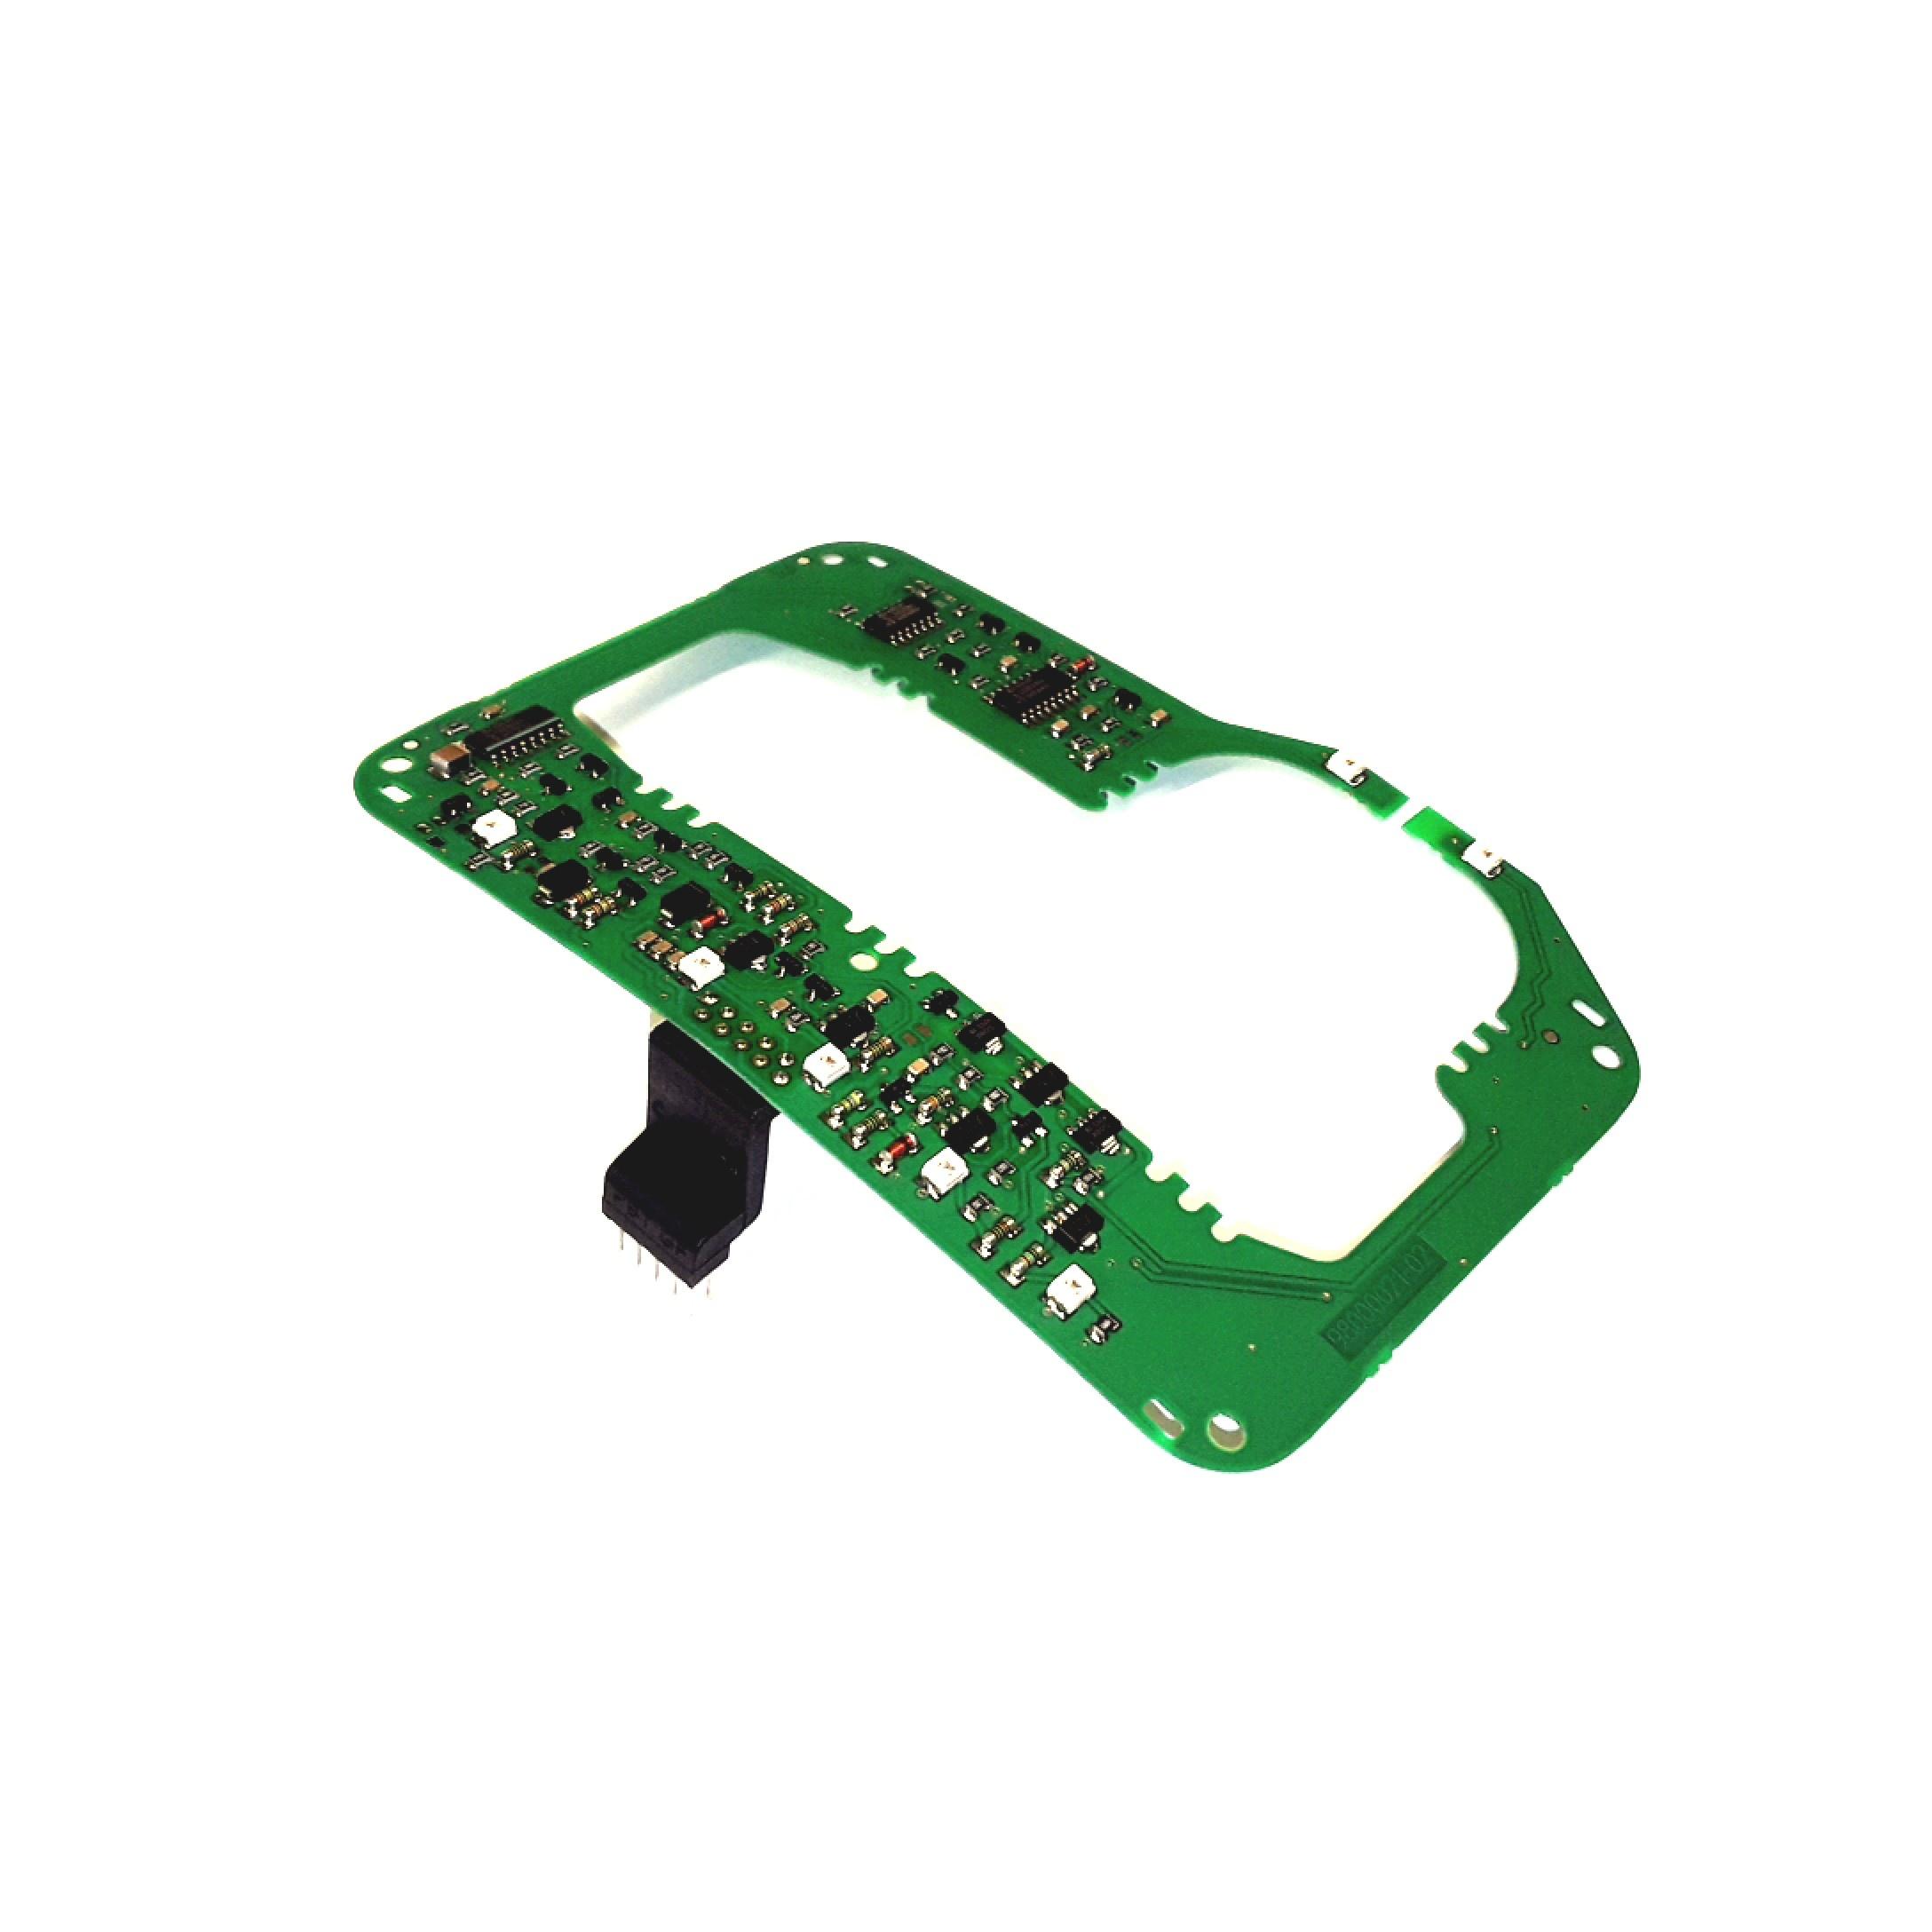 7l6713243d - Circuit Board  Print Circ  Shifter And Components